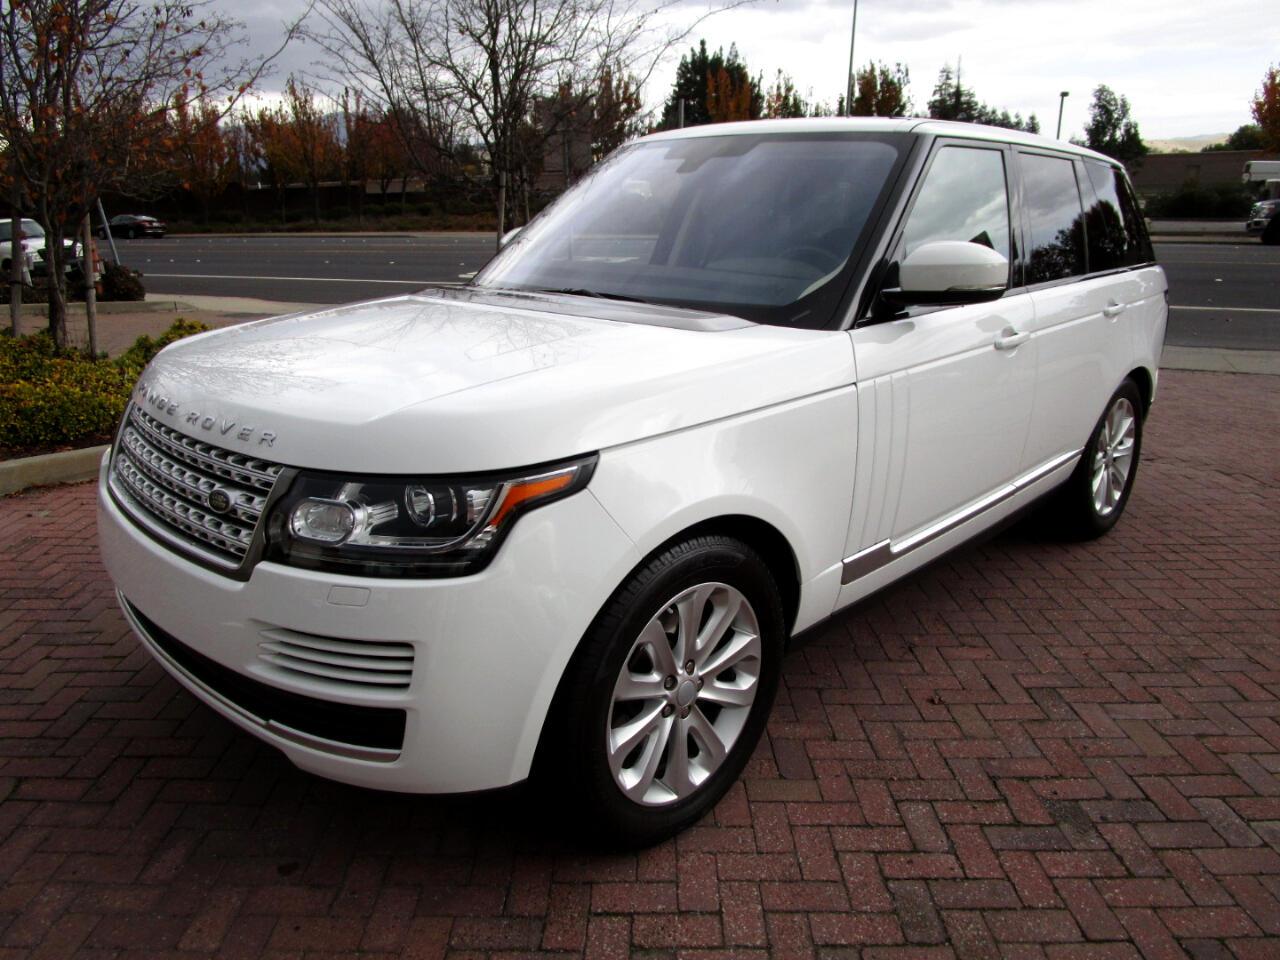 2016 Land Rover Range Rover HSE DIESEL**PANO*HEAT/AC SEATS*R/HEAT SEATS/STEER